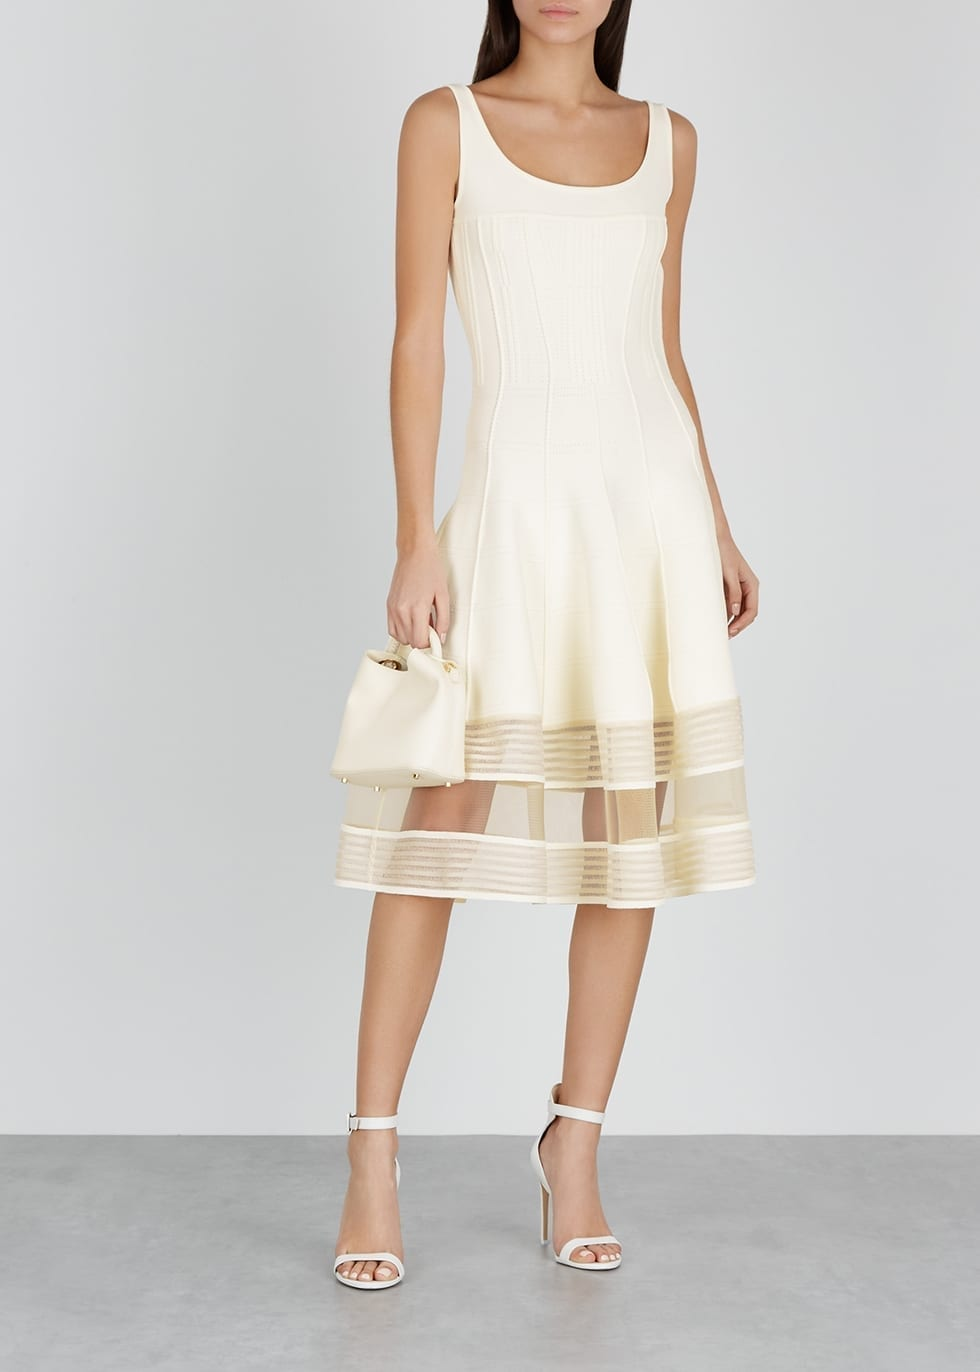 d95d42d8ac ALEXANDER MCQUEEN Sheer-Panelled Stretch-Knit Midi White Dress - We ...